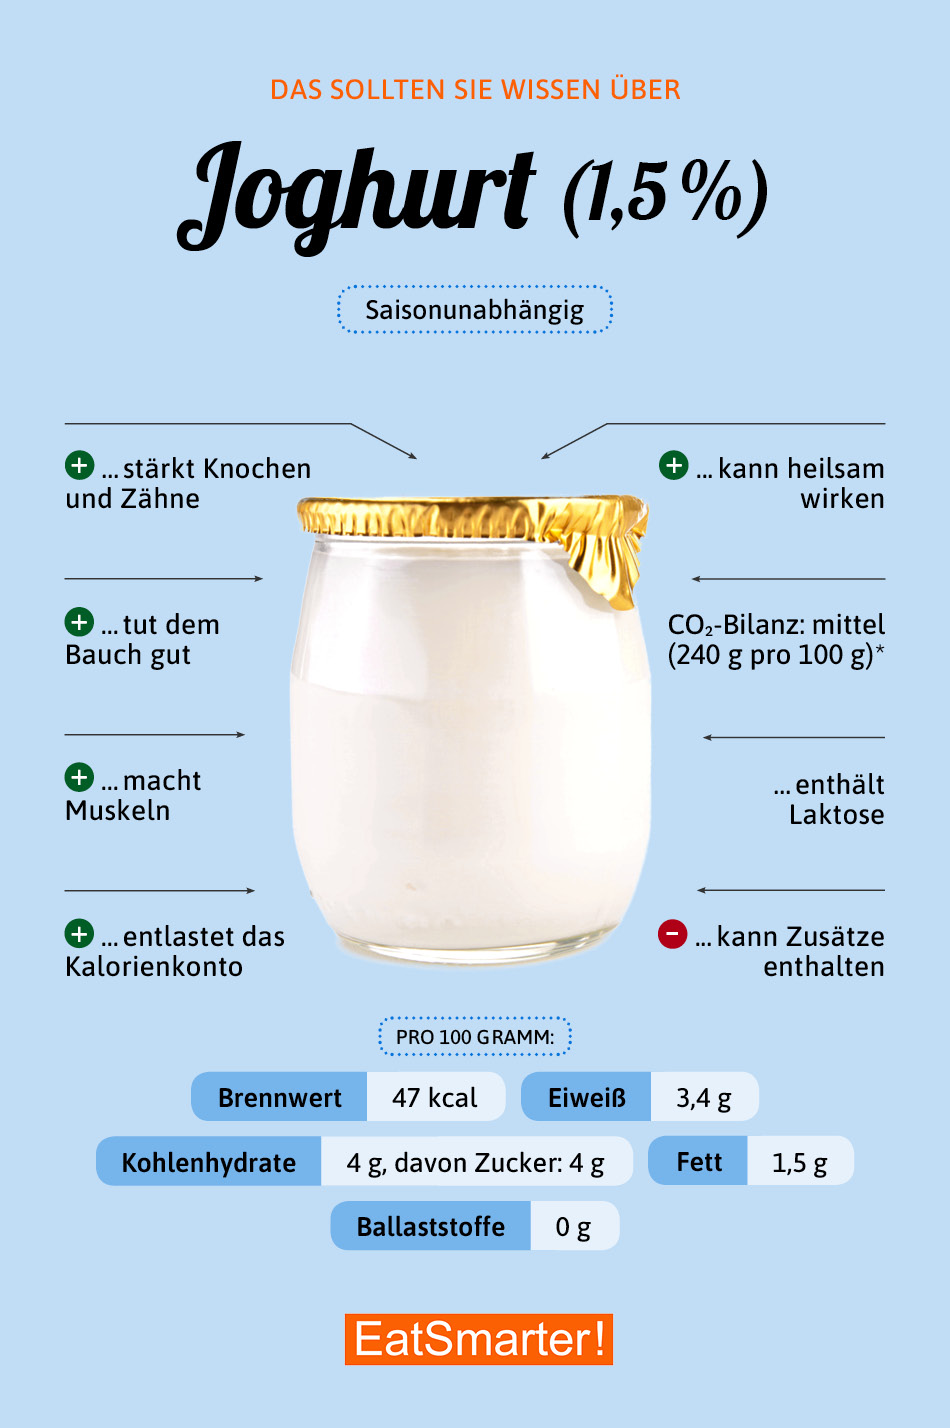 Infografik Joghurt 1,5%